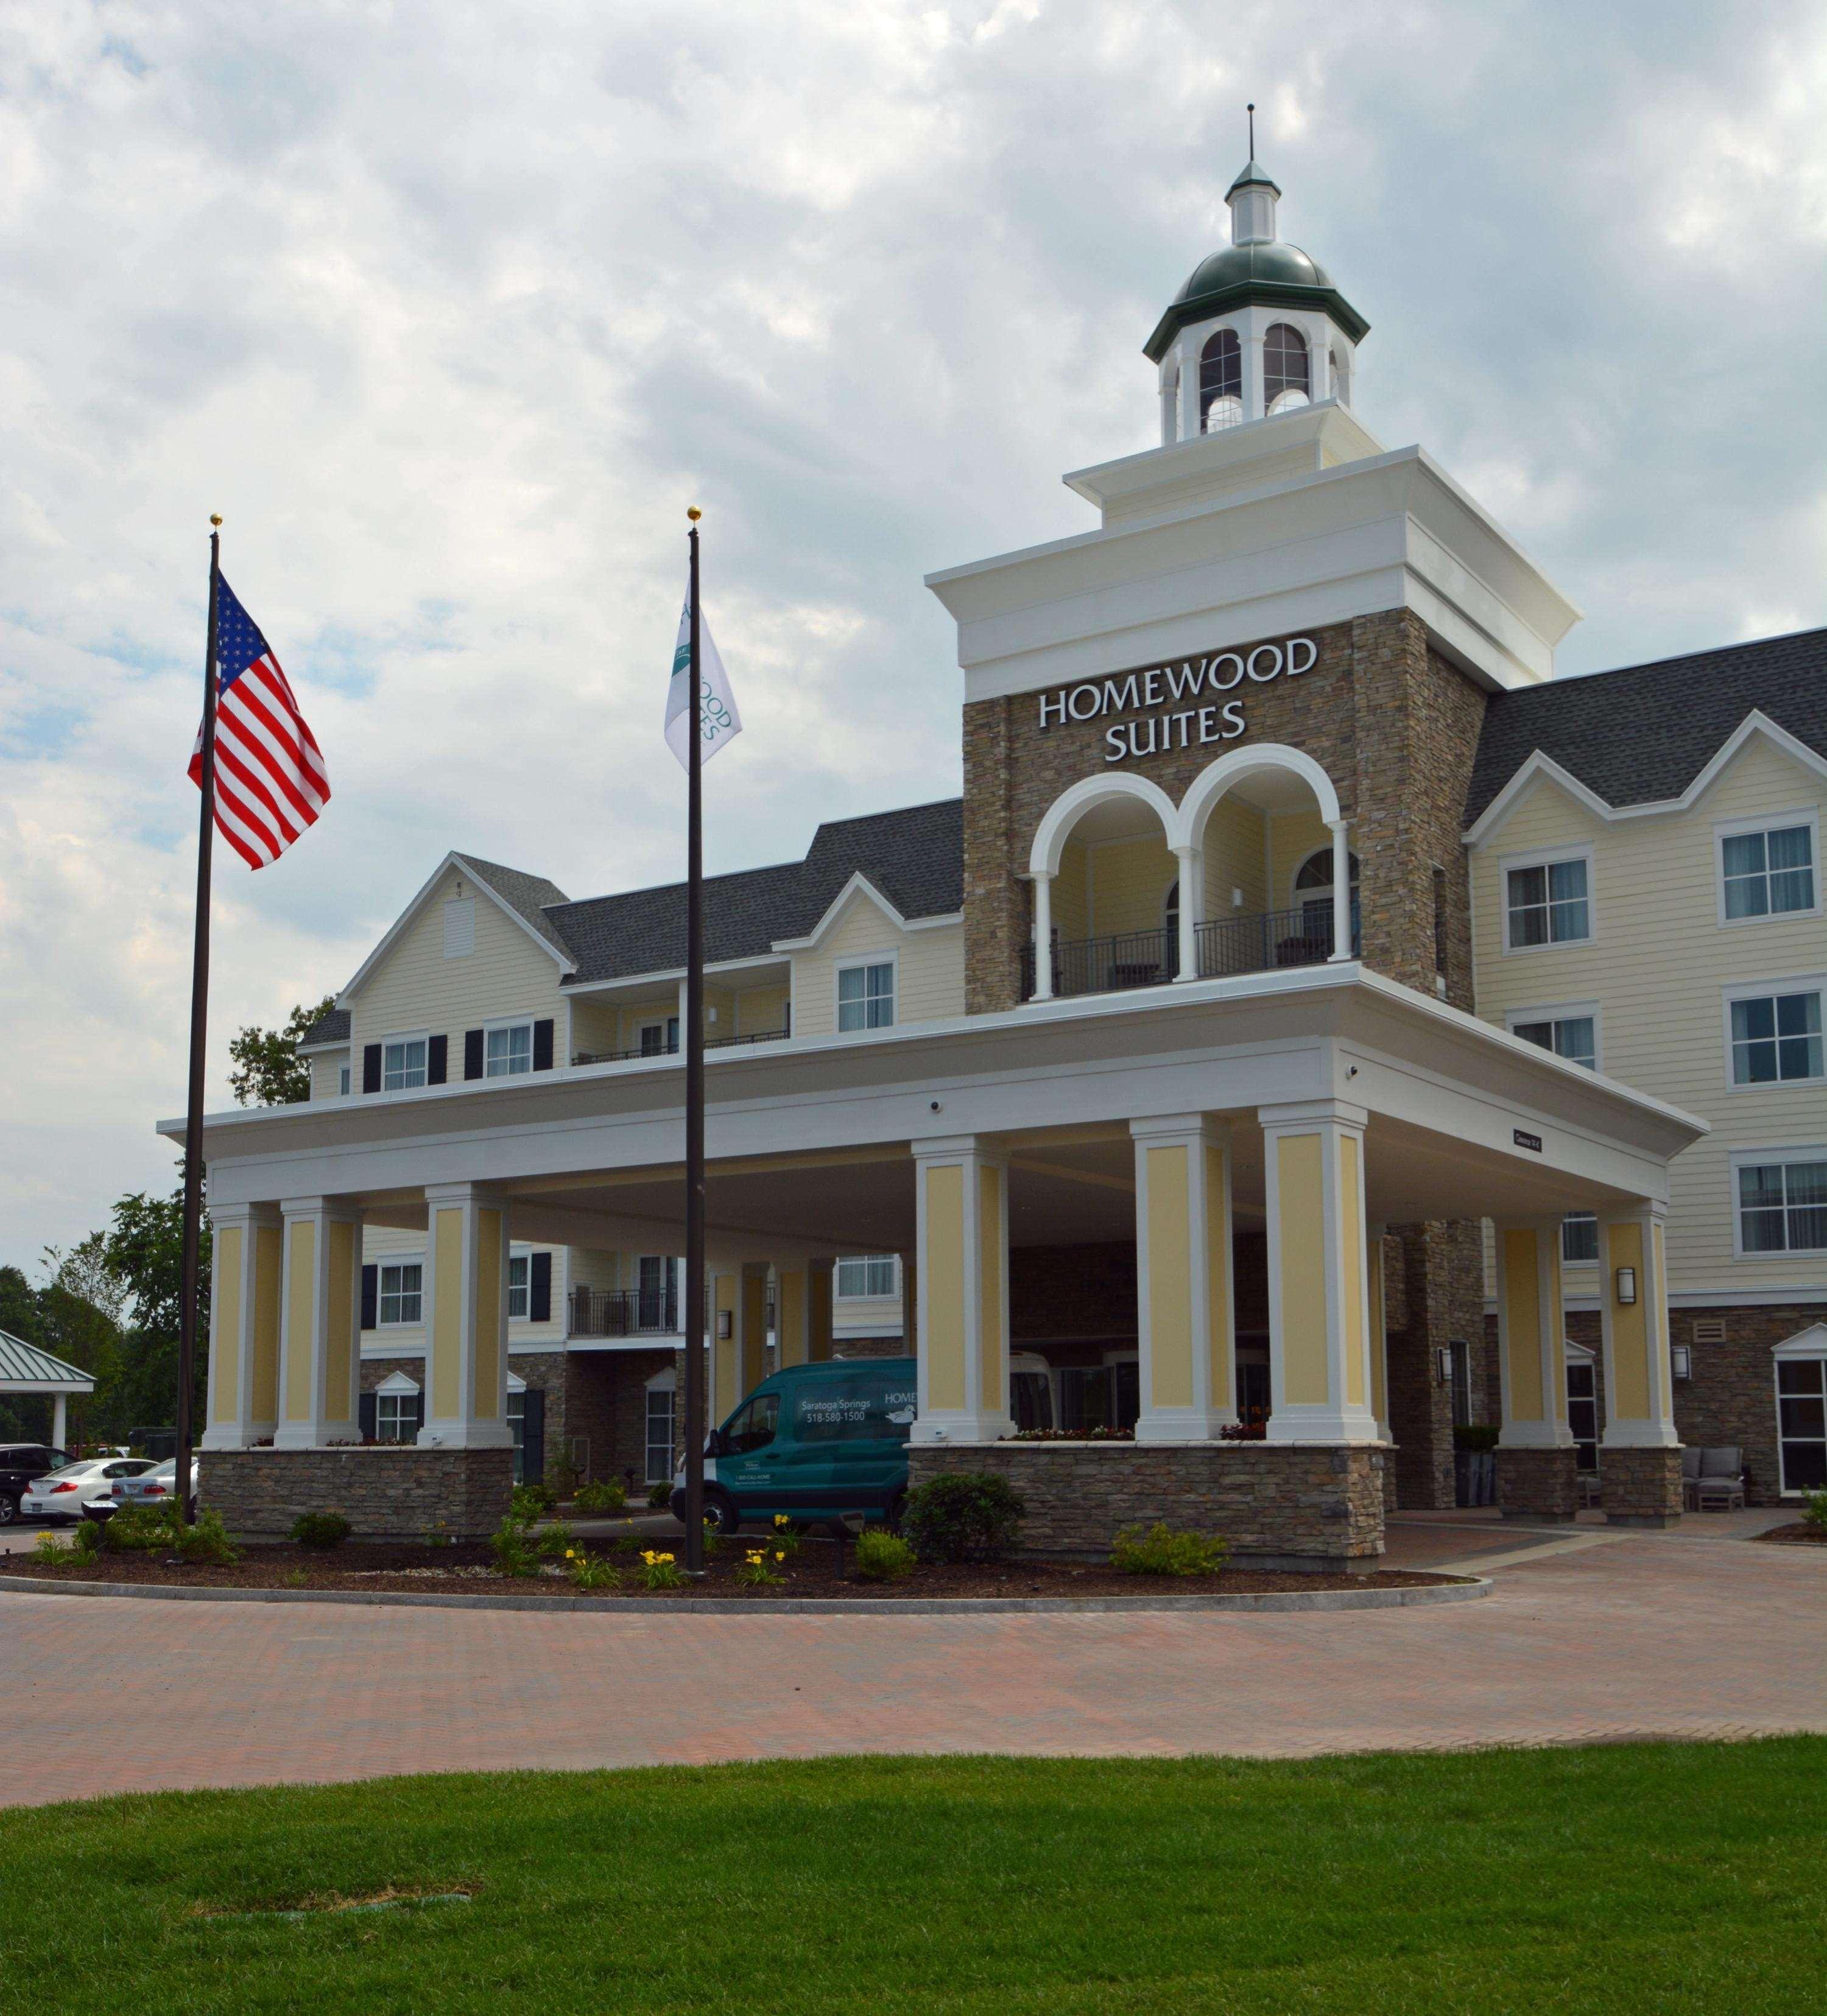 Homewood Suites by Hilton Saratoga Springs image 20